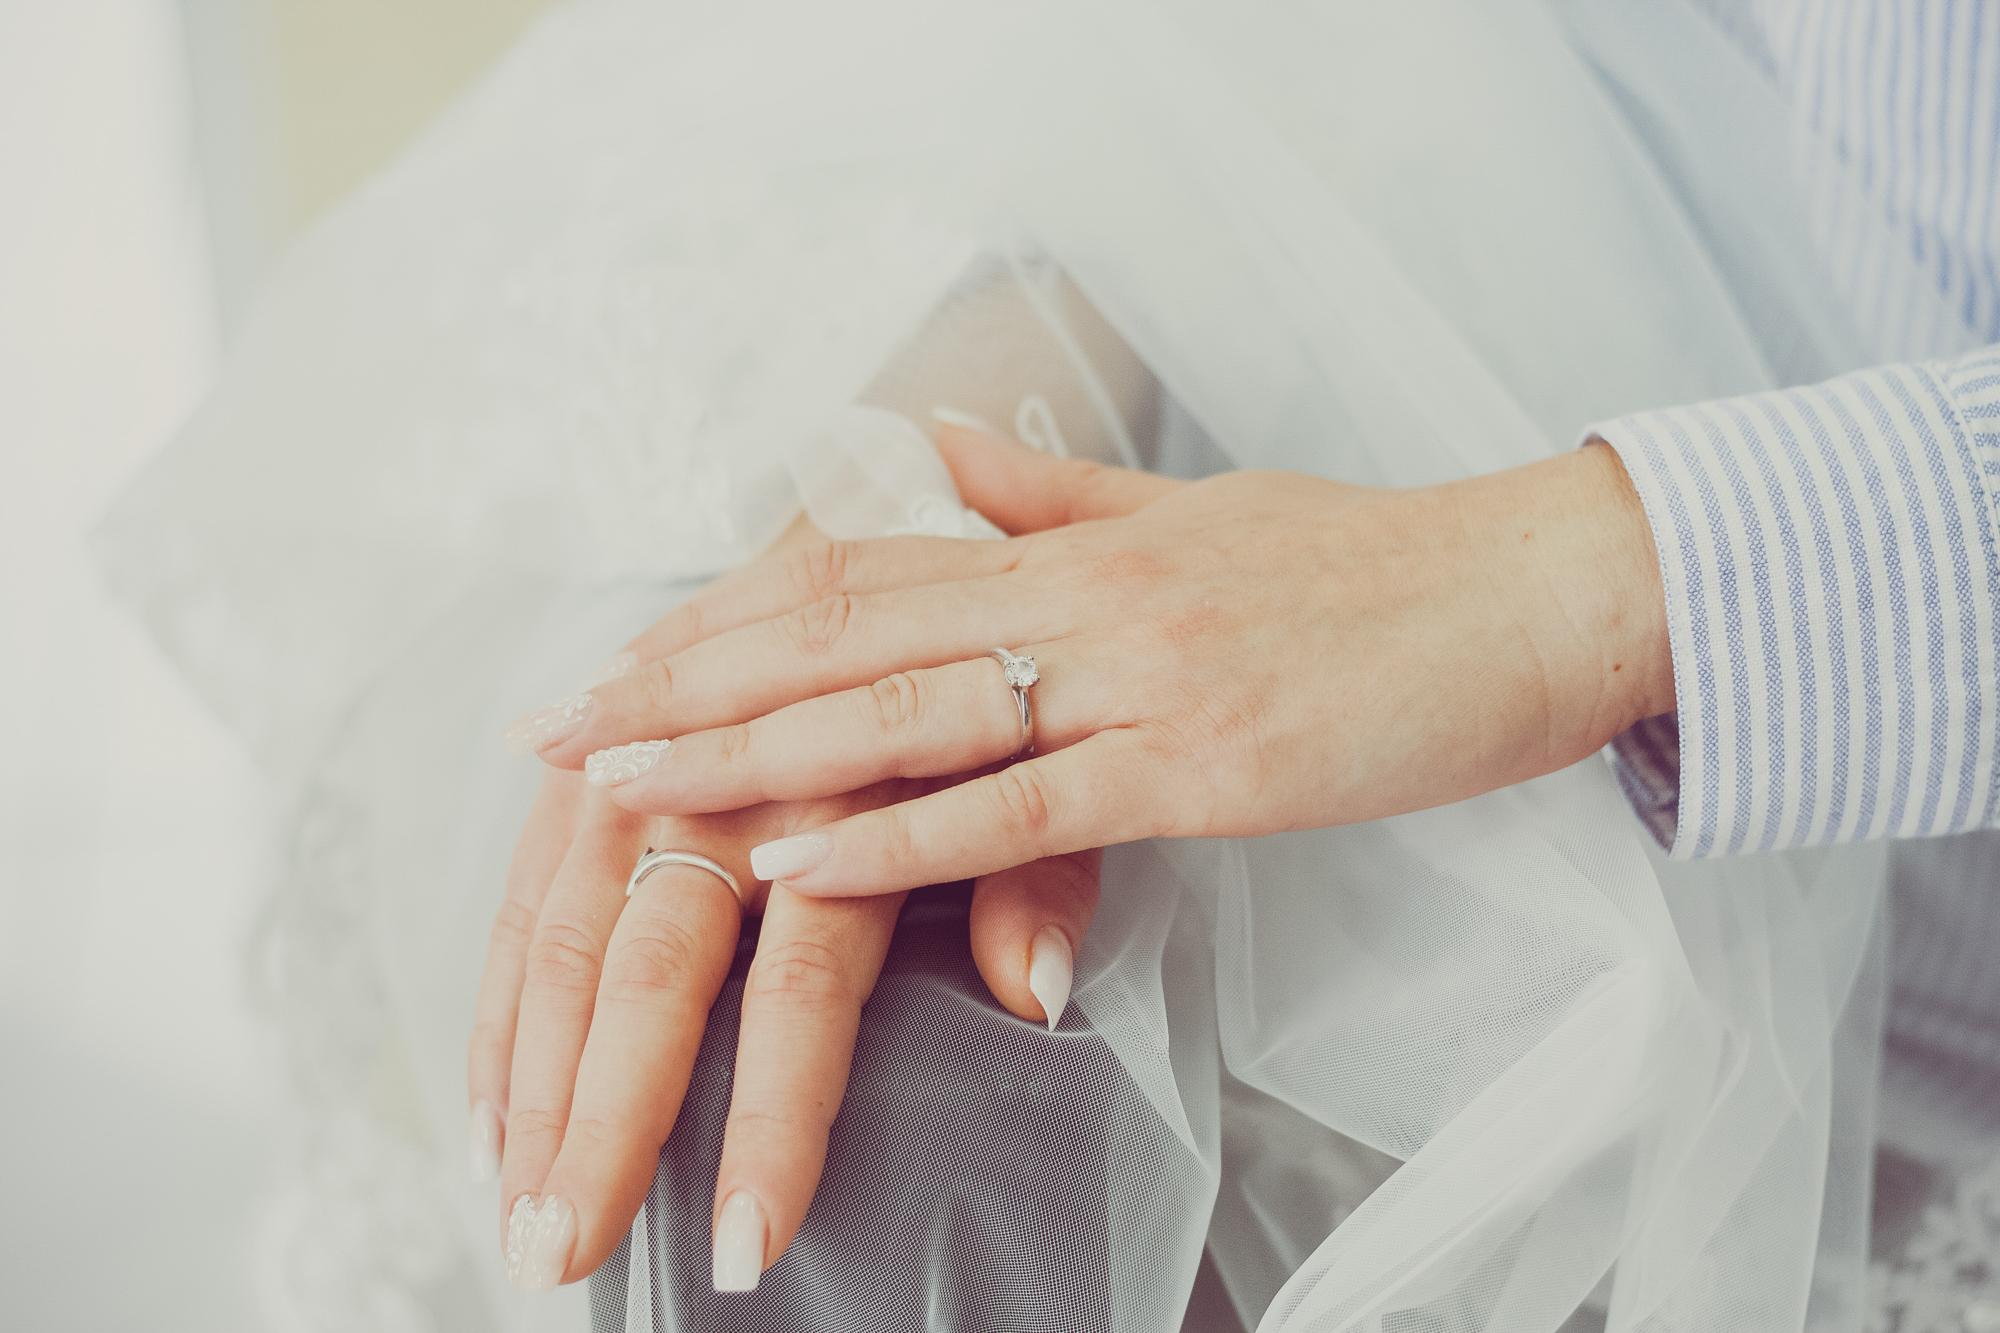 fotografie nunta, pregatirea miresei, inel de logodna, voalul miresei, mainile miresei